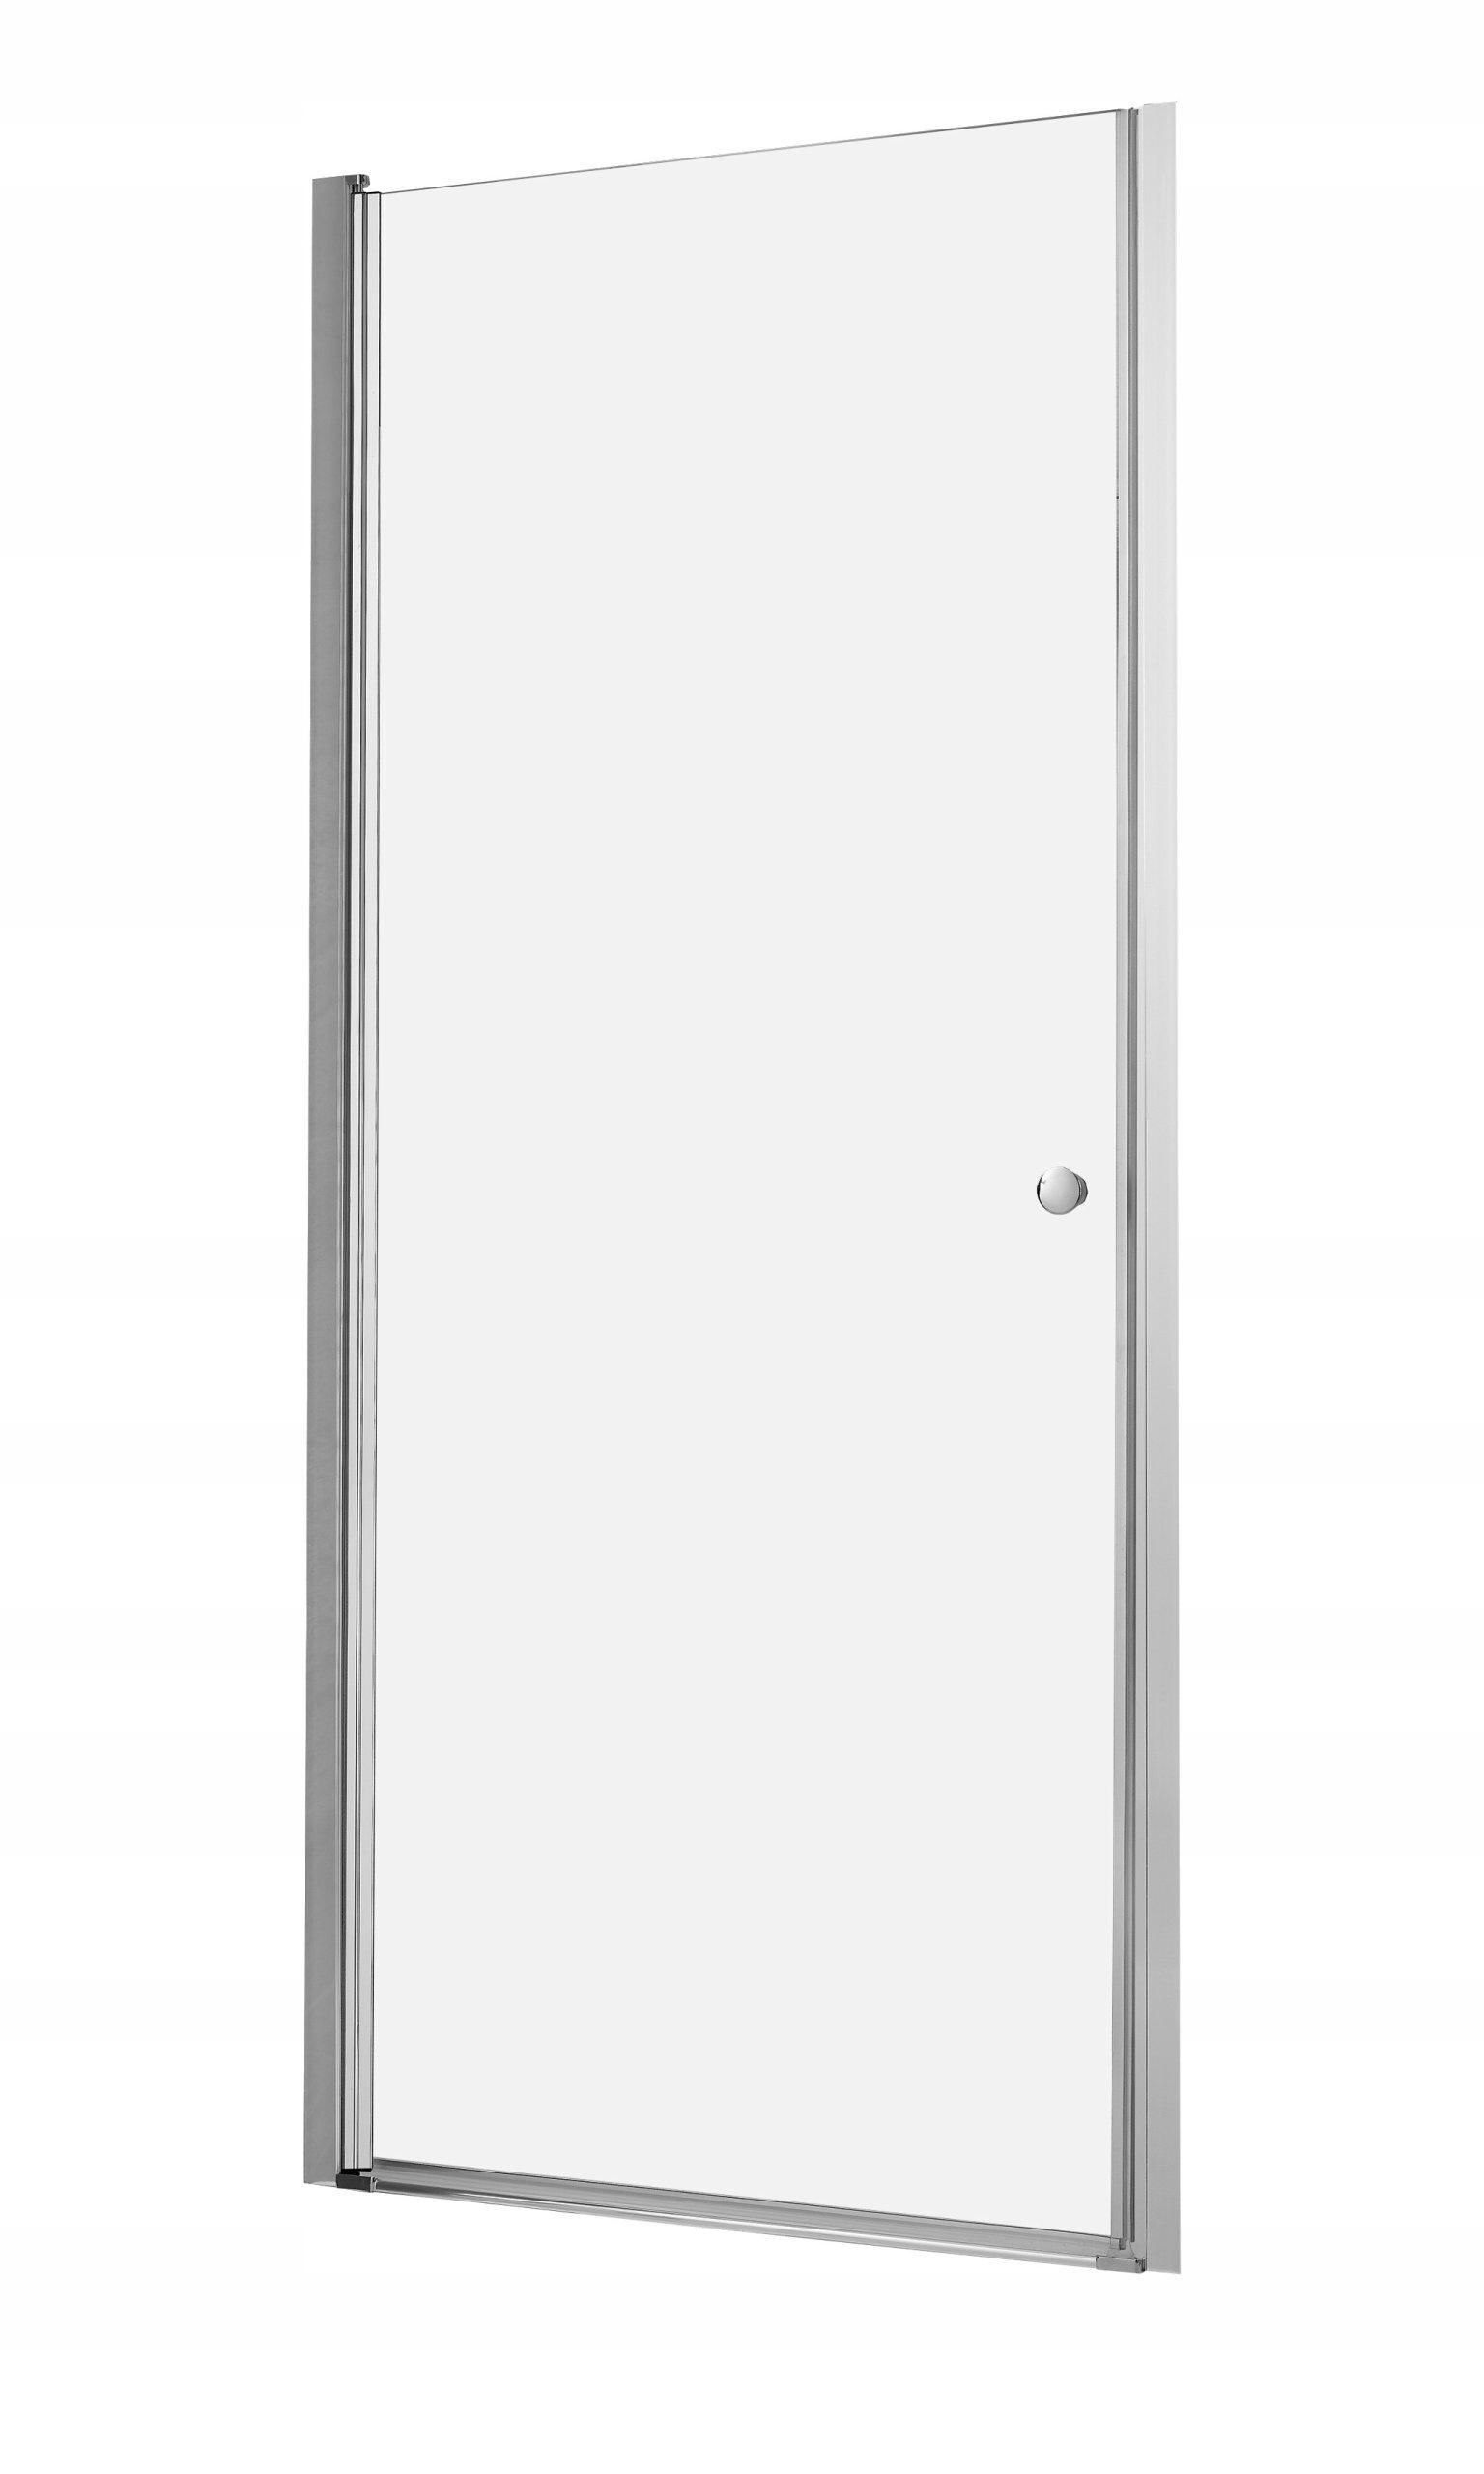 Sprchové dvere Eos DWJ 90x197 cm RADAWAY